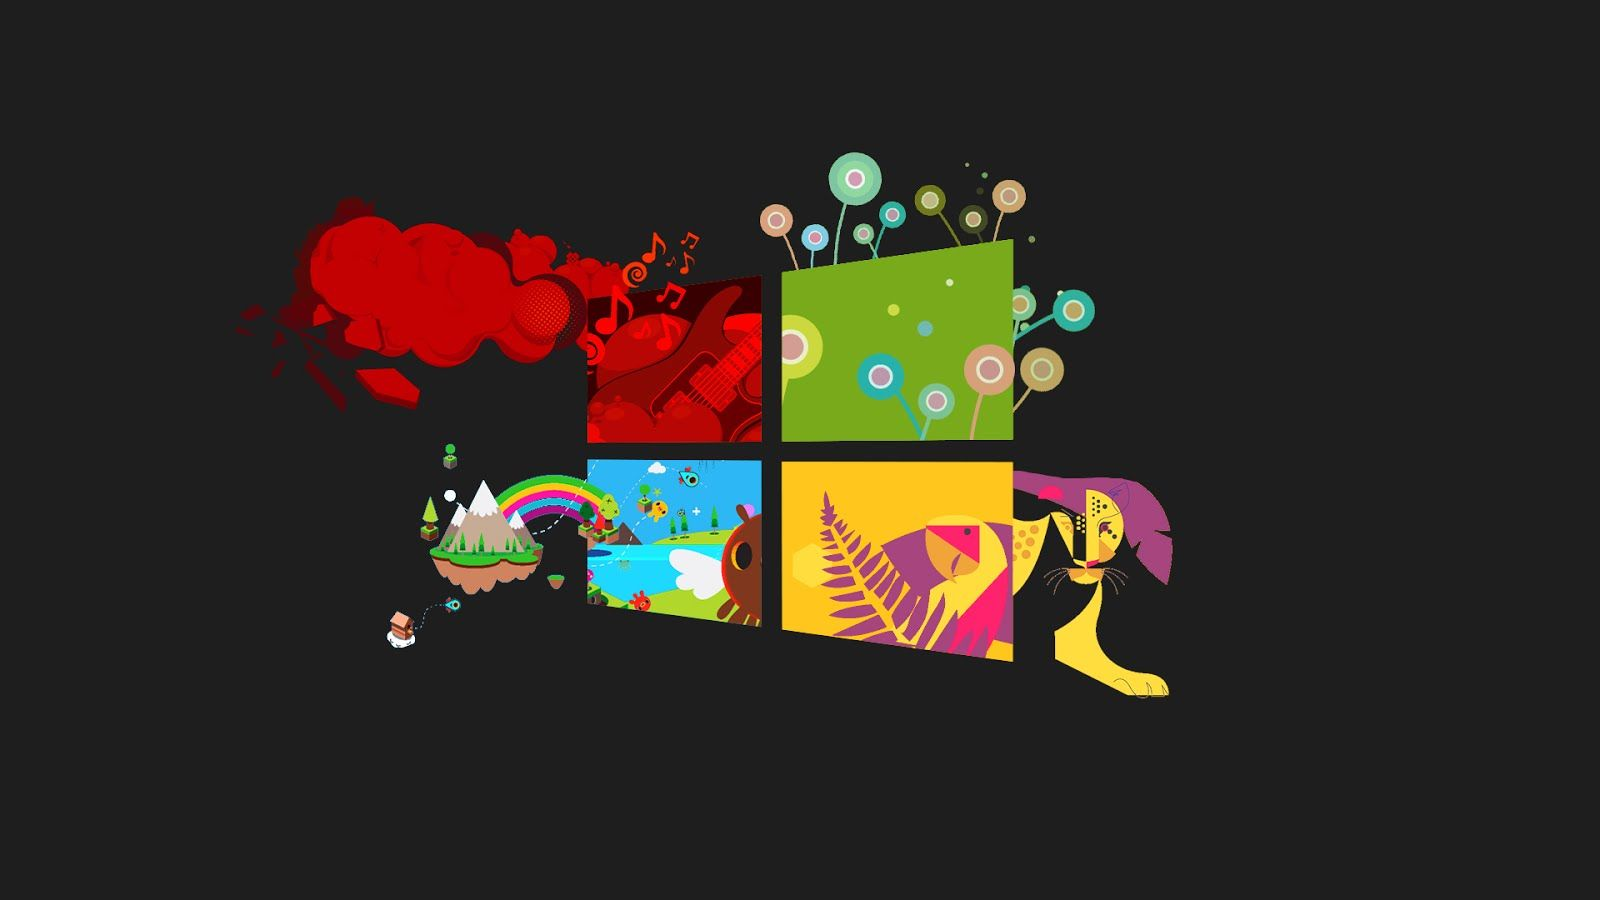 NEW Kumpulan Wallpaper Windows 8 Gratis Terbaru 2014